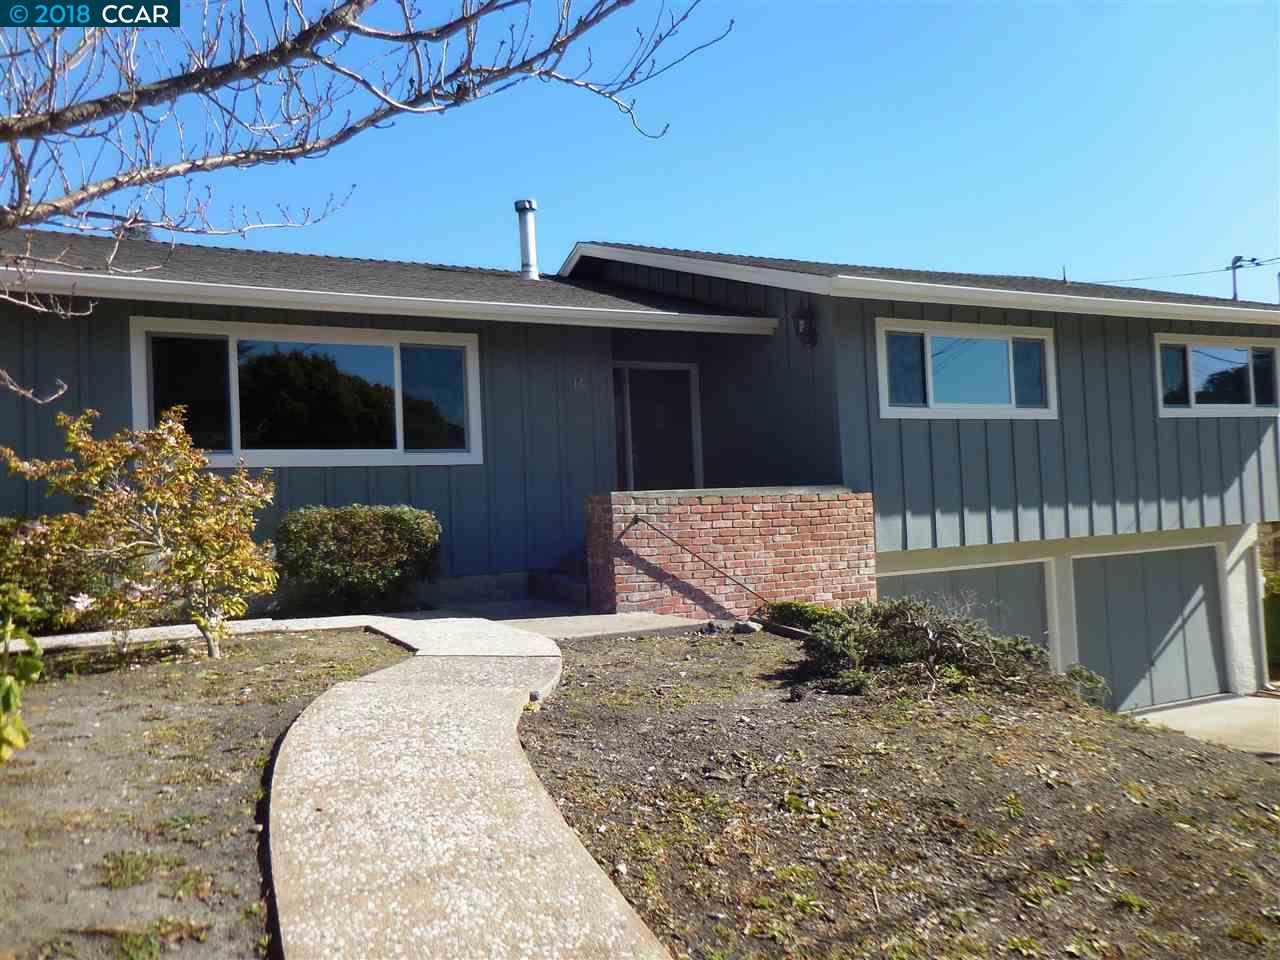 Single Family Home for Rent at 16 La Honda Court 16 La Honda Court El Sobrante, California 94803 United States